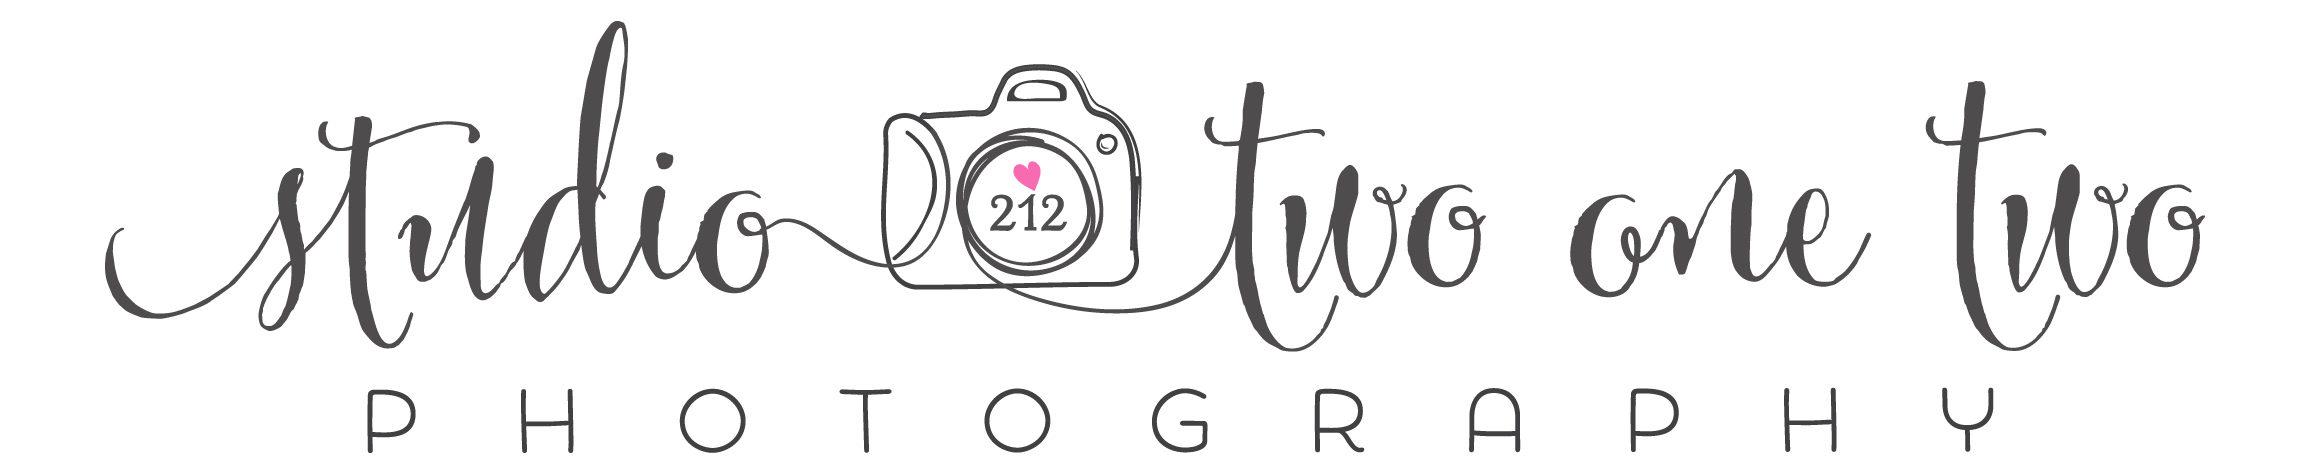 Columbia, SC Wedding, Engagement and Portrait Photographer